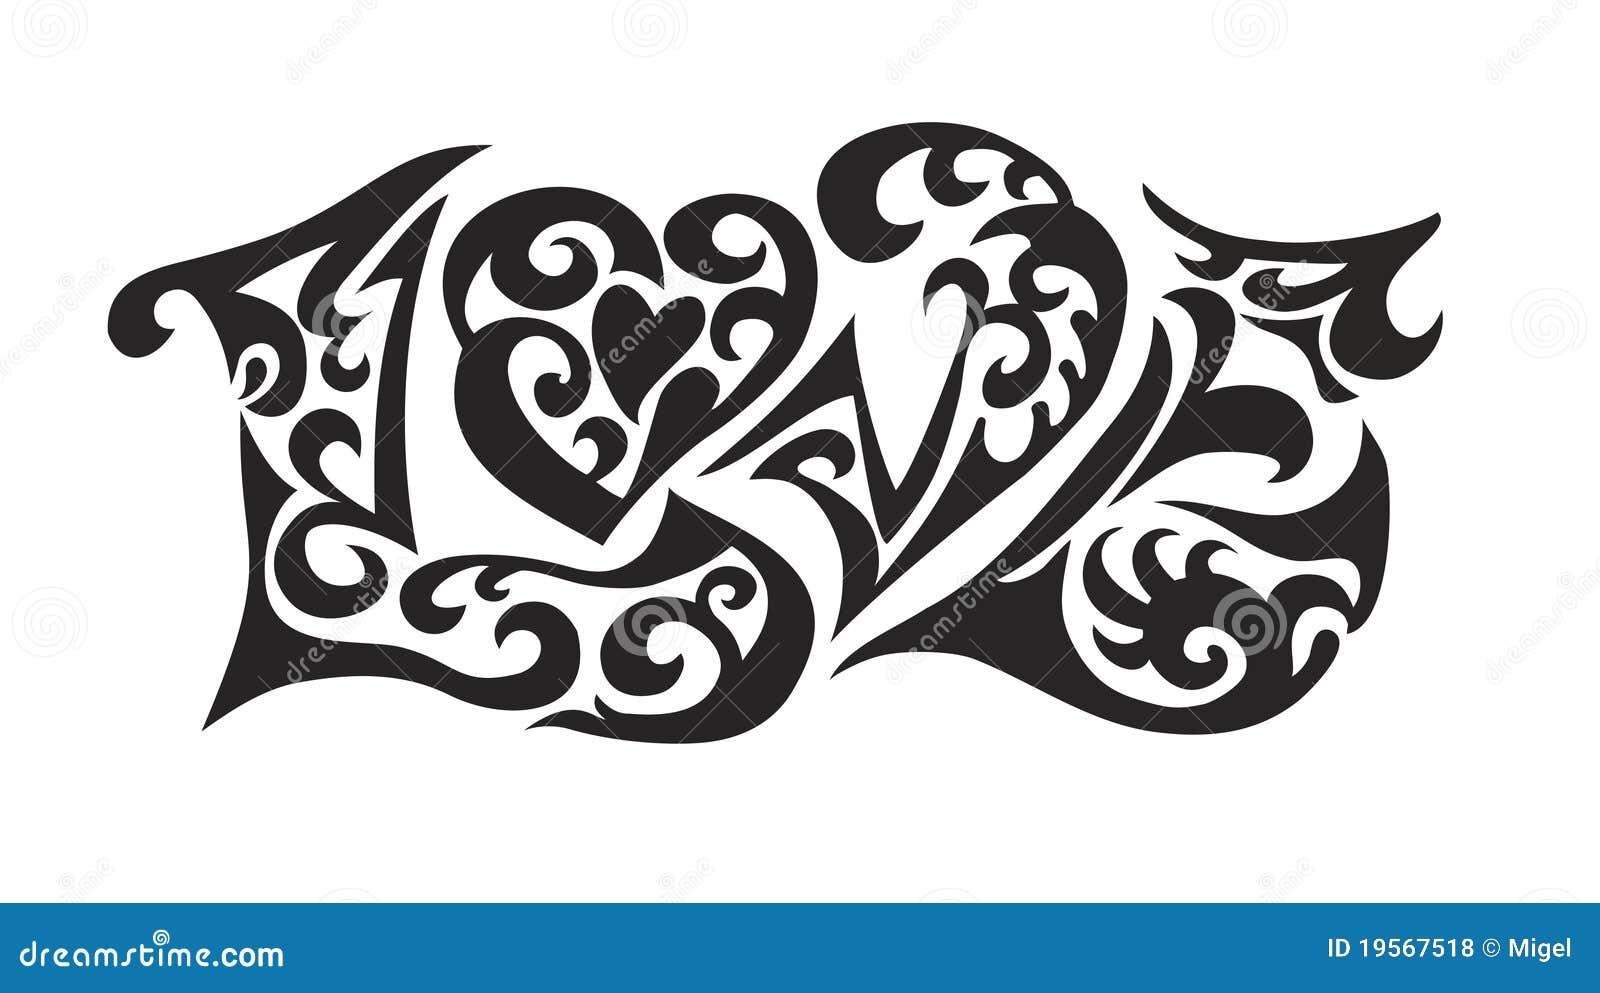 Royalty Free Stock Photos Word Logo Love Tatoo Image19567518 on Spiral Clip Art